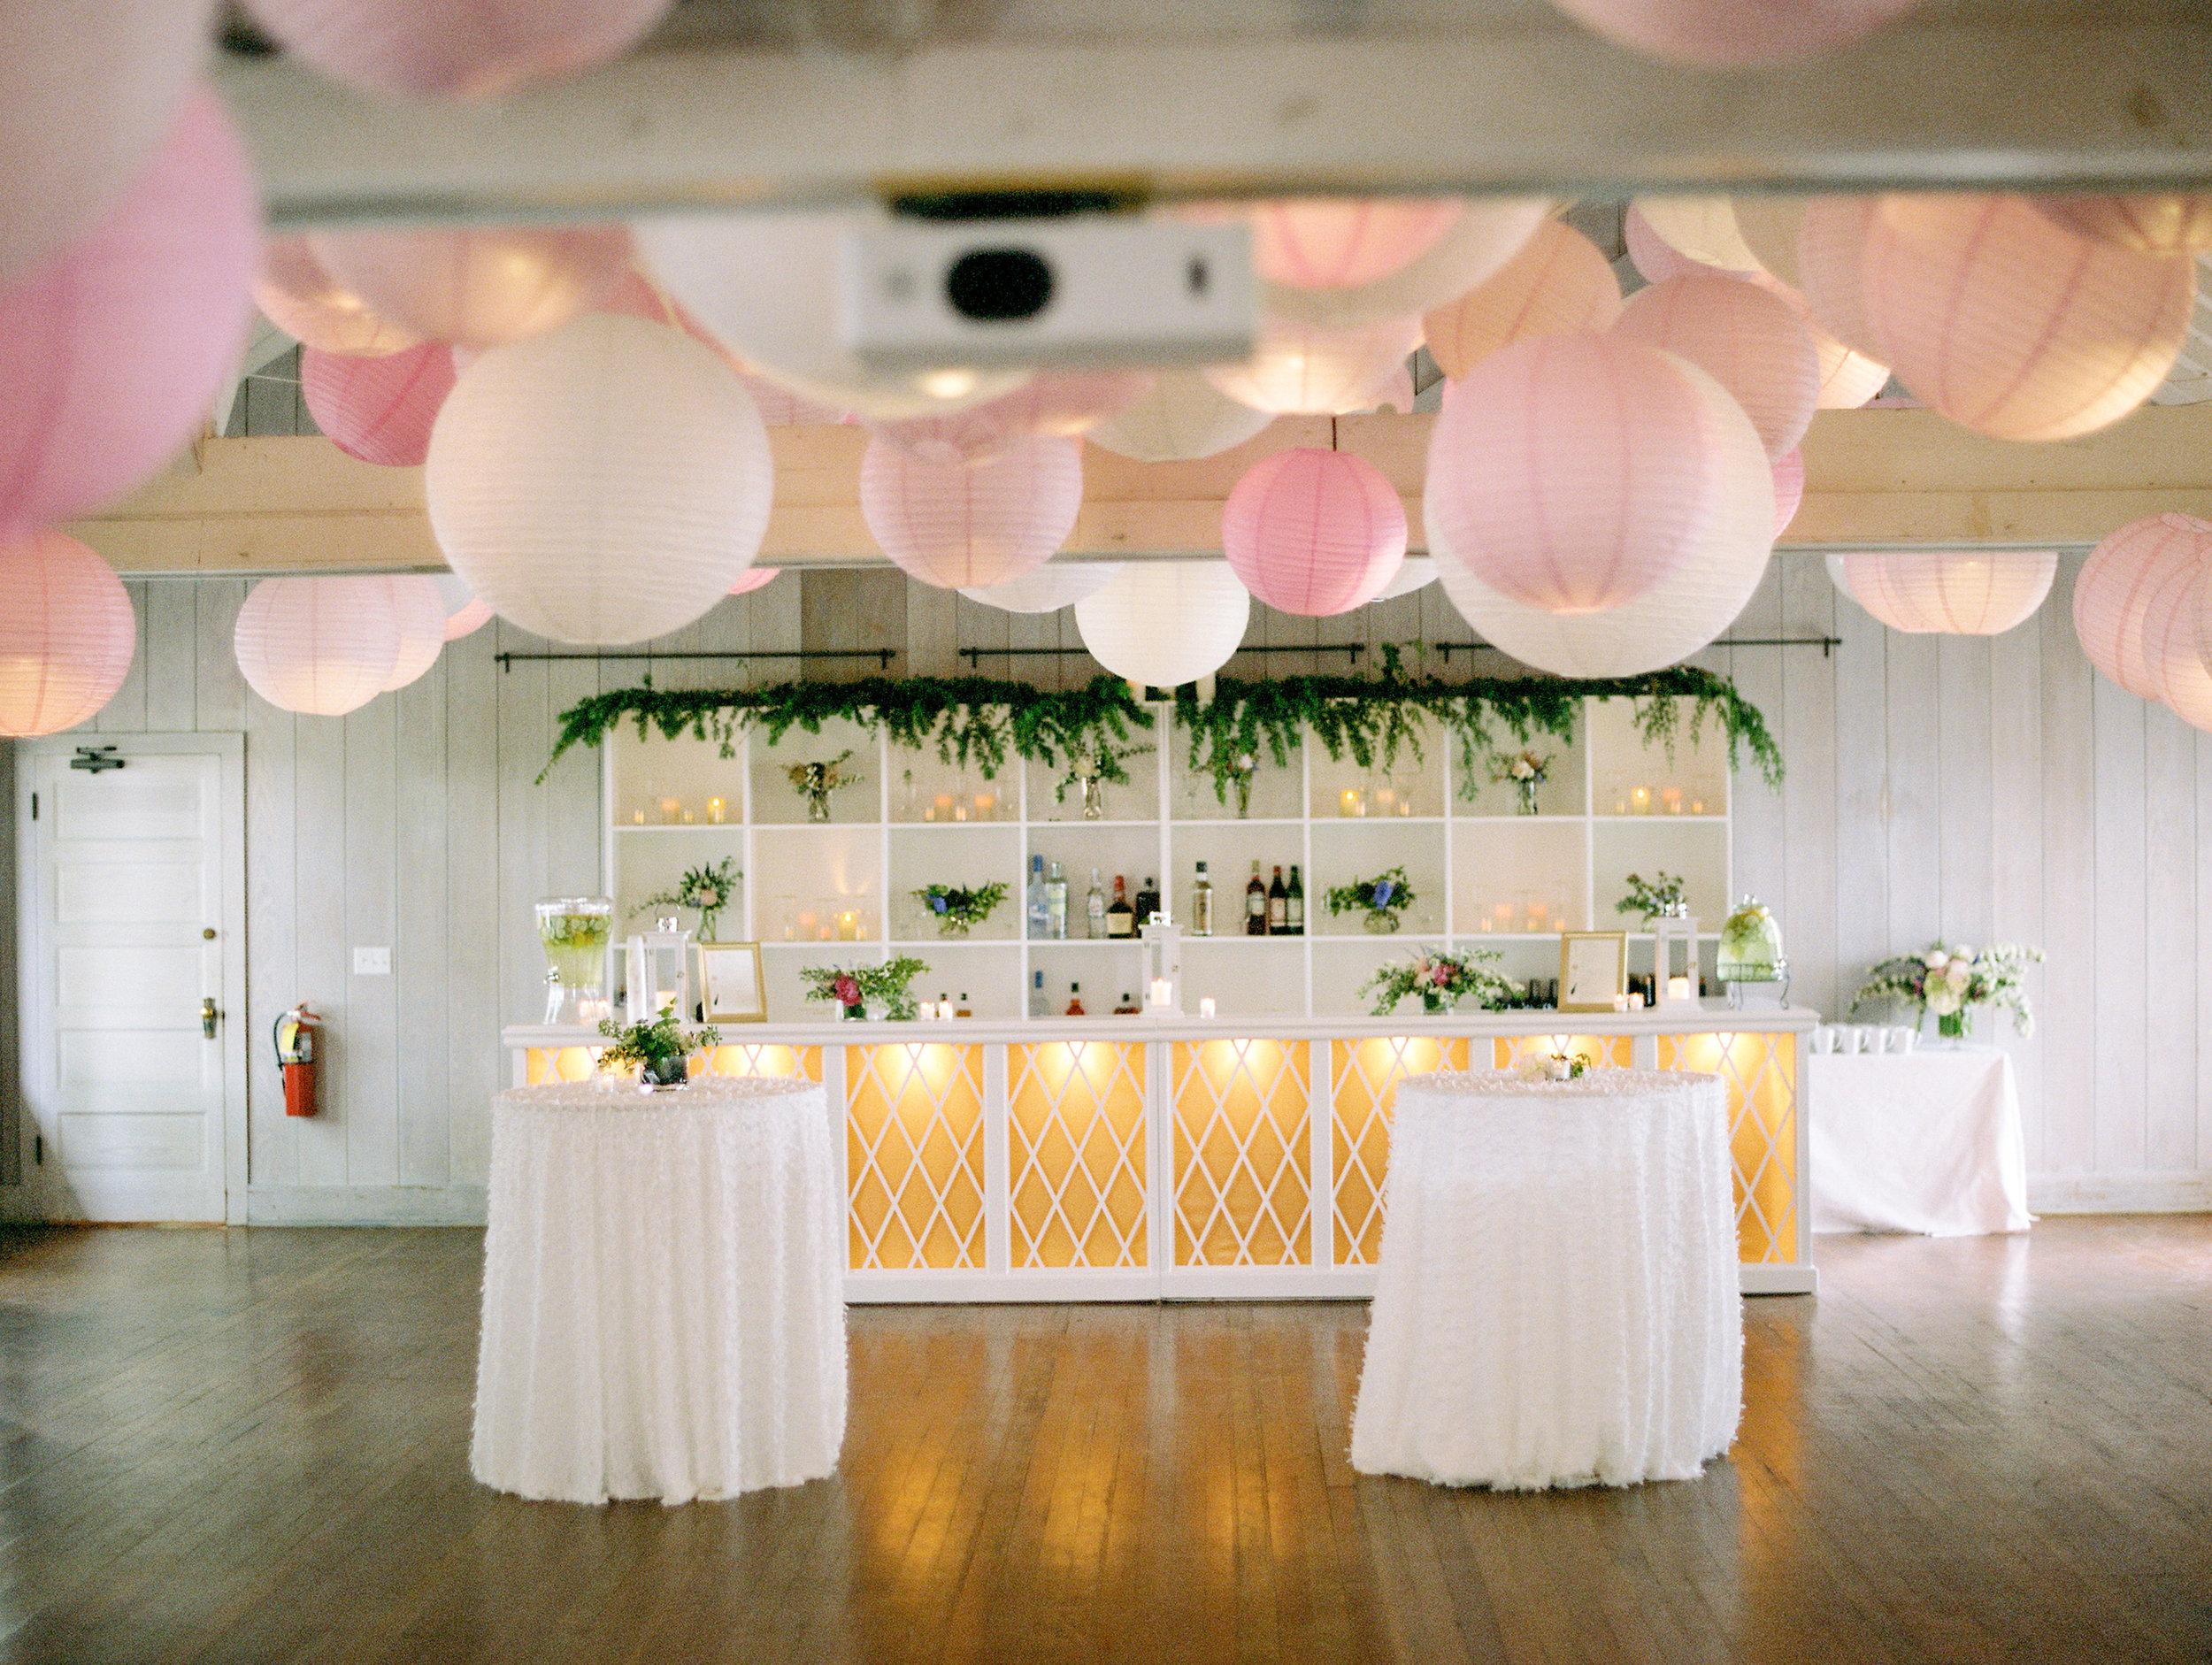 Coffman+Wedding+Reception+Details-85.jpg